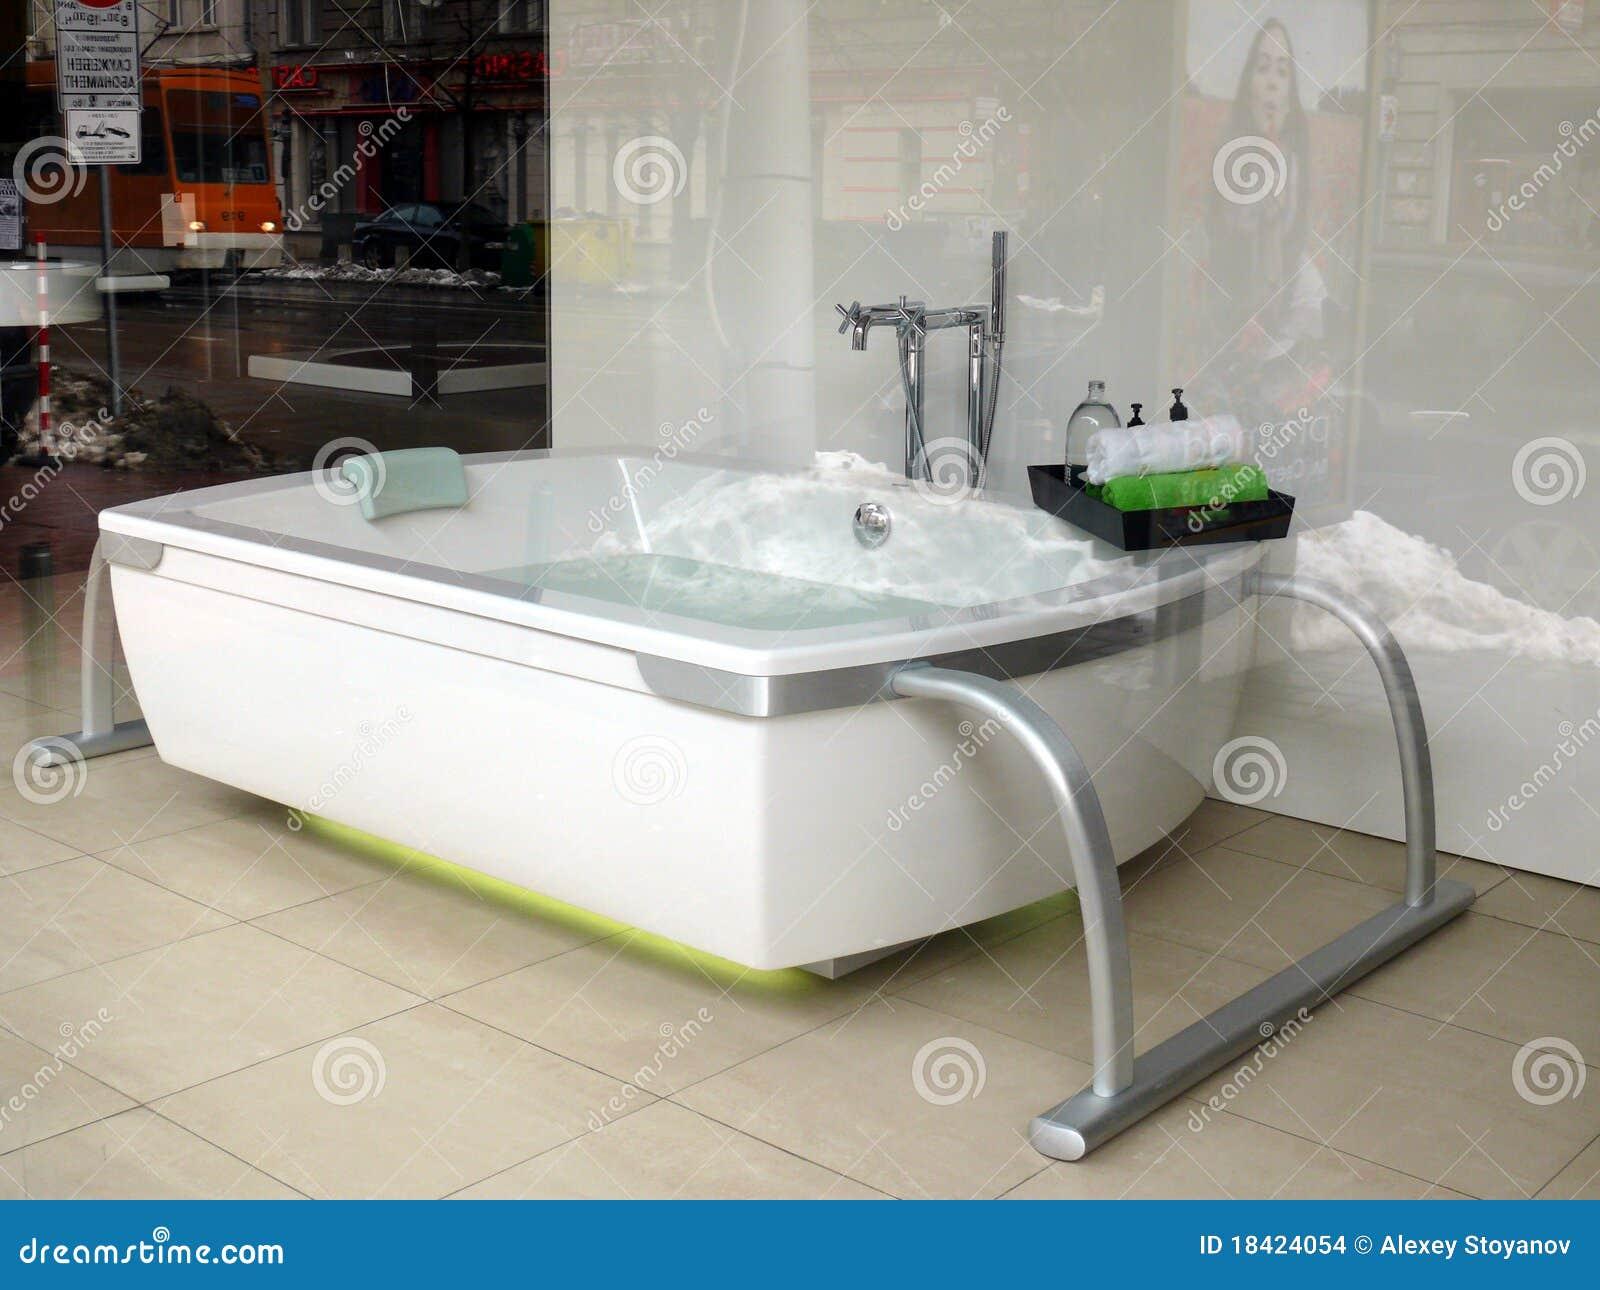 Fundamental Nursing Skills – How to Give a Bed Bath